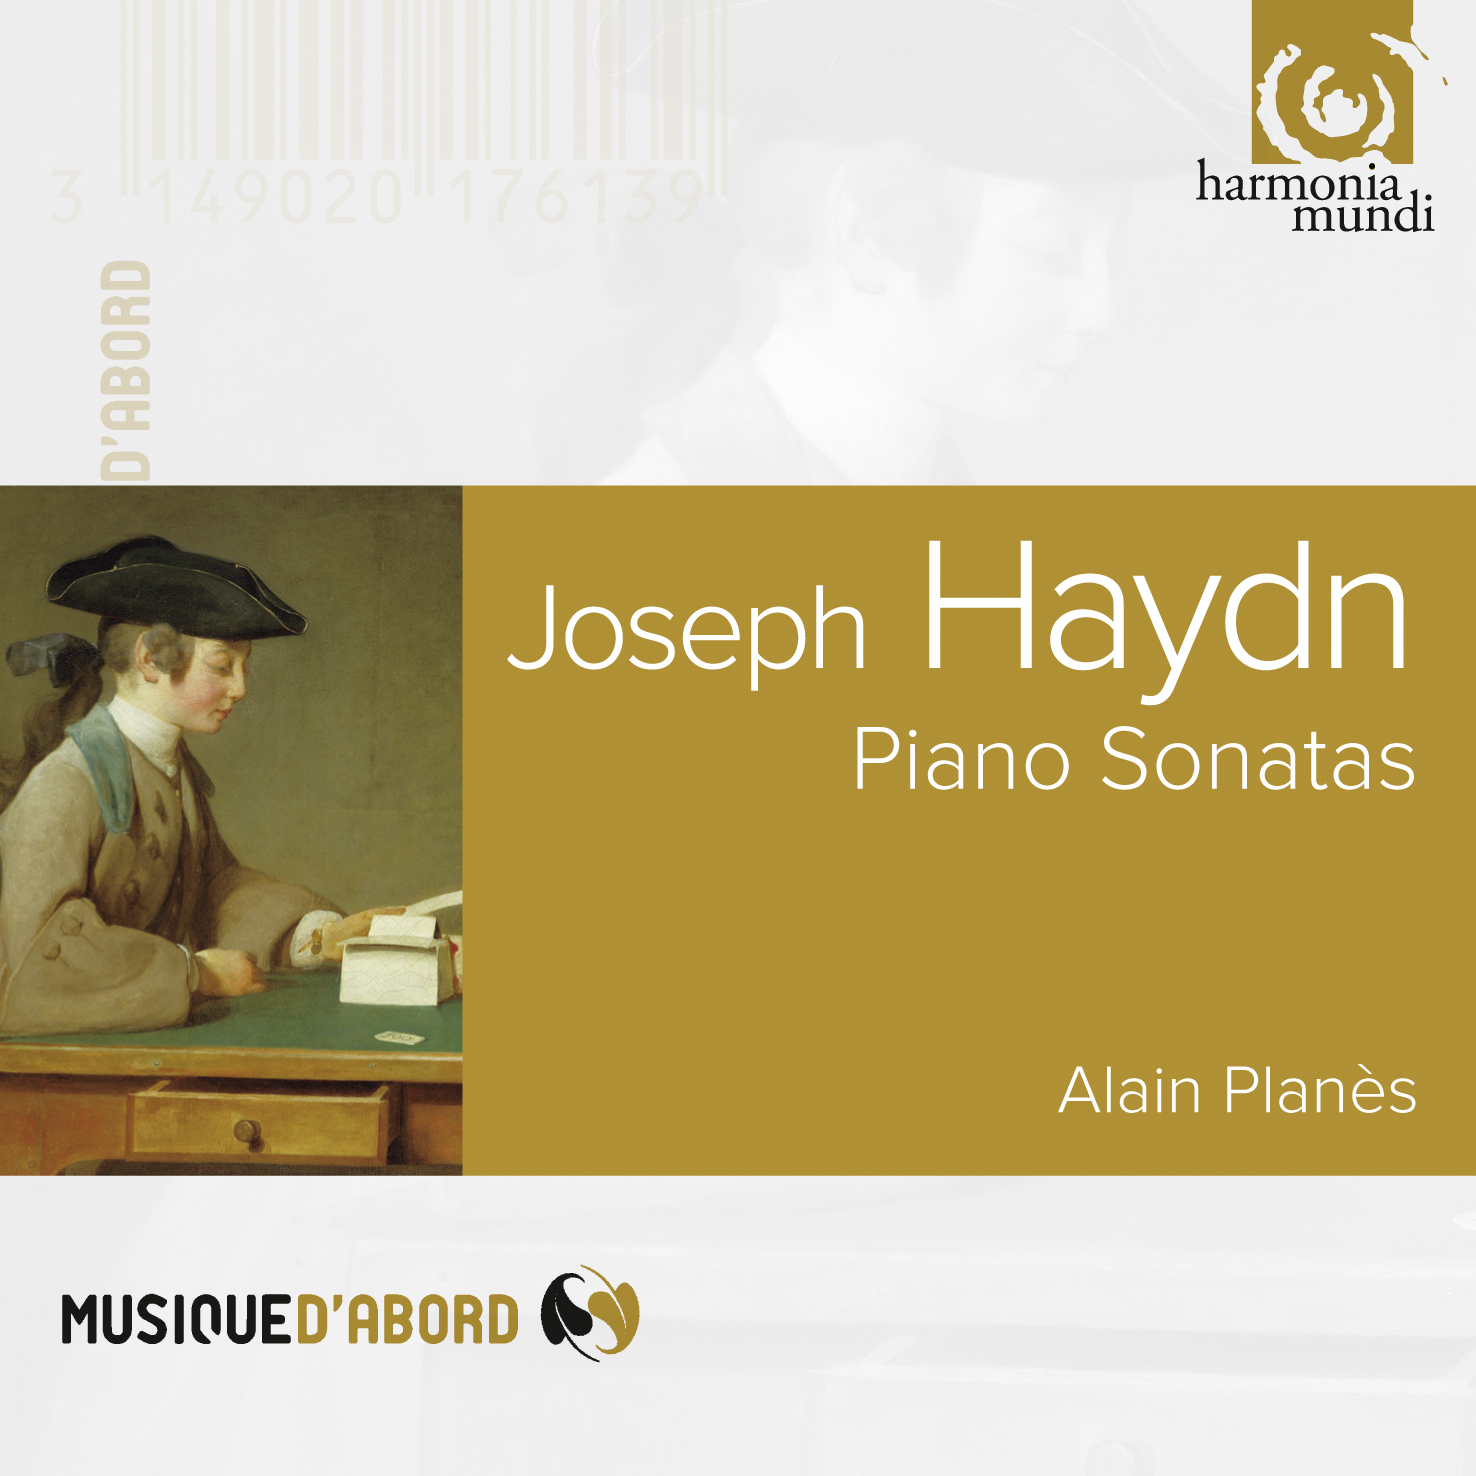 haydn piano sonata Chan 10942 haydn - piano sonatas, volume 6 running time: 83:18 release  date: may 2017 originally recorded in 2016 composer franz joseph haydn.